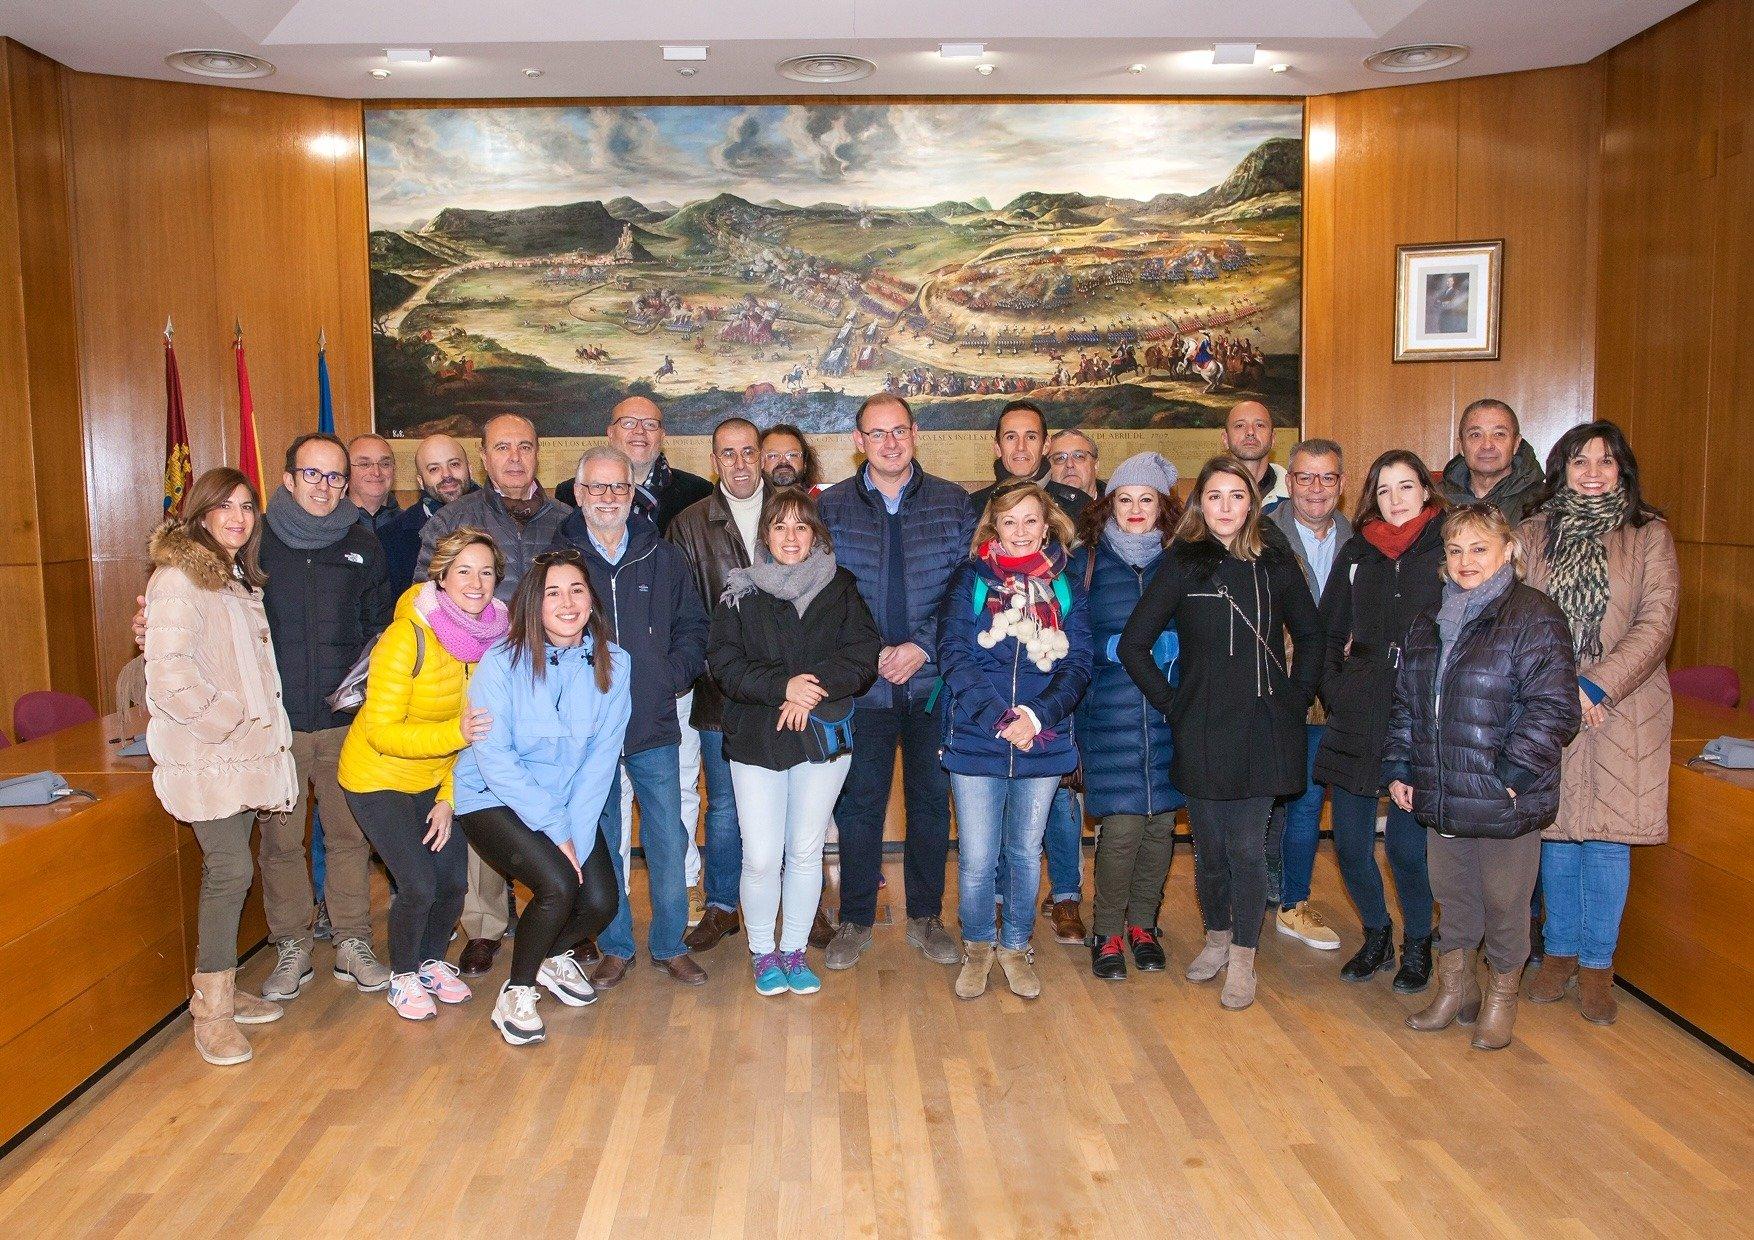 Javier Roselló, alcalde de Almansa, recibe a la Asociación de Periodistas de Albacete